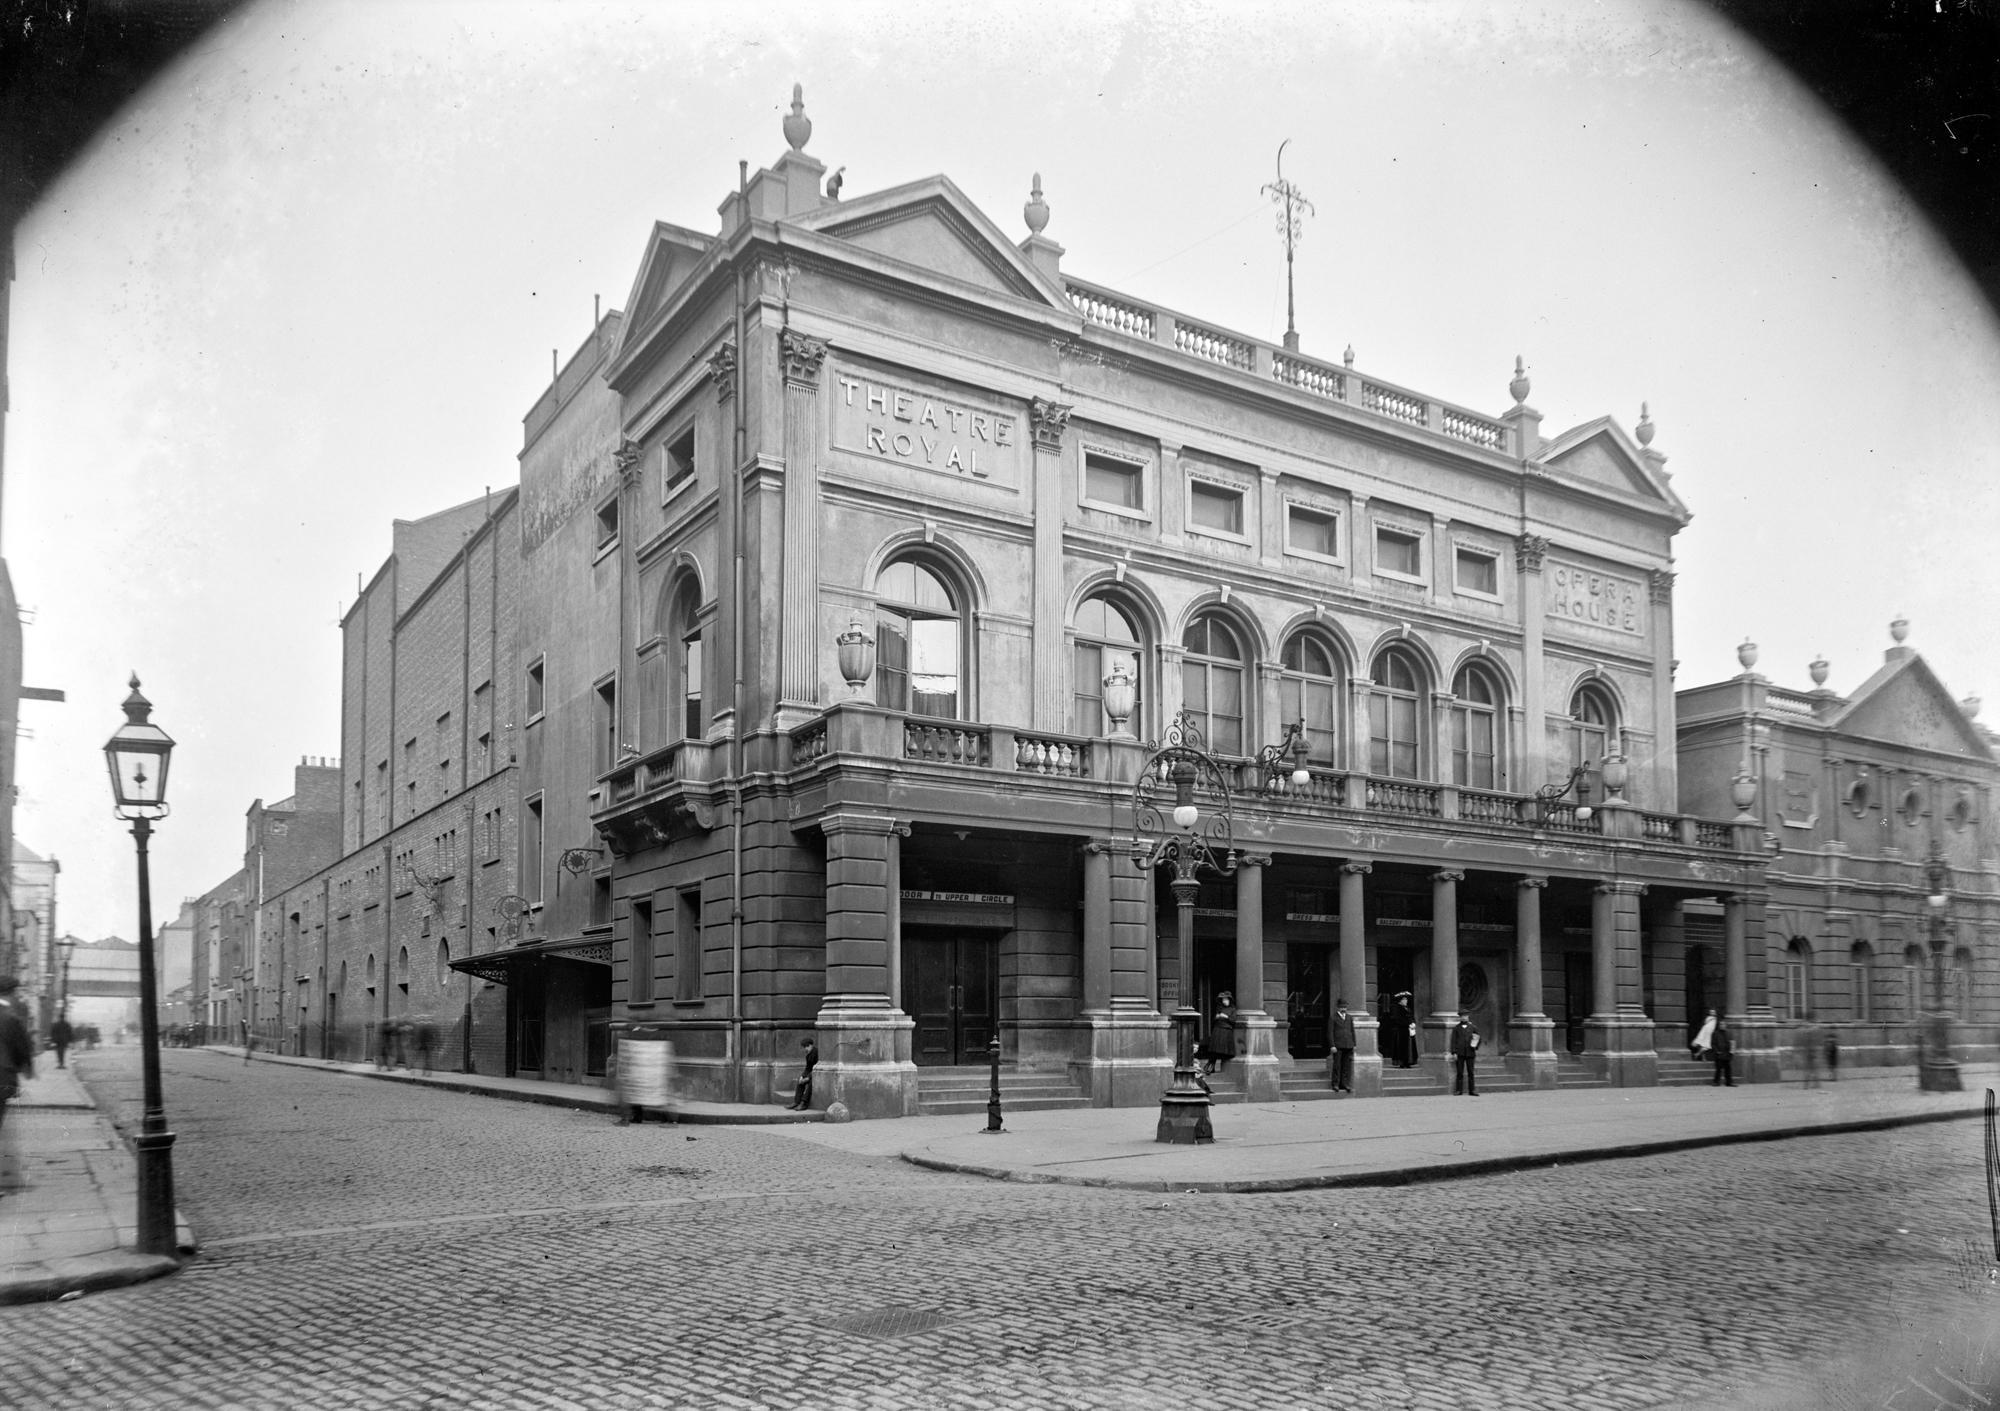 Theatre Royal, Hawkins Street, Dublin